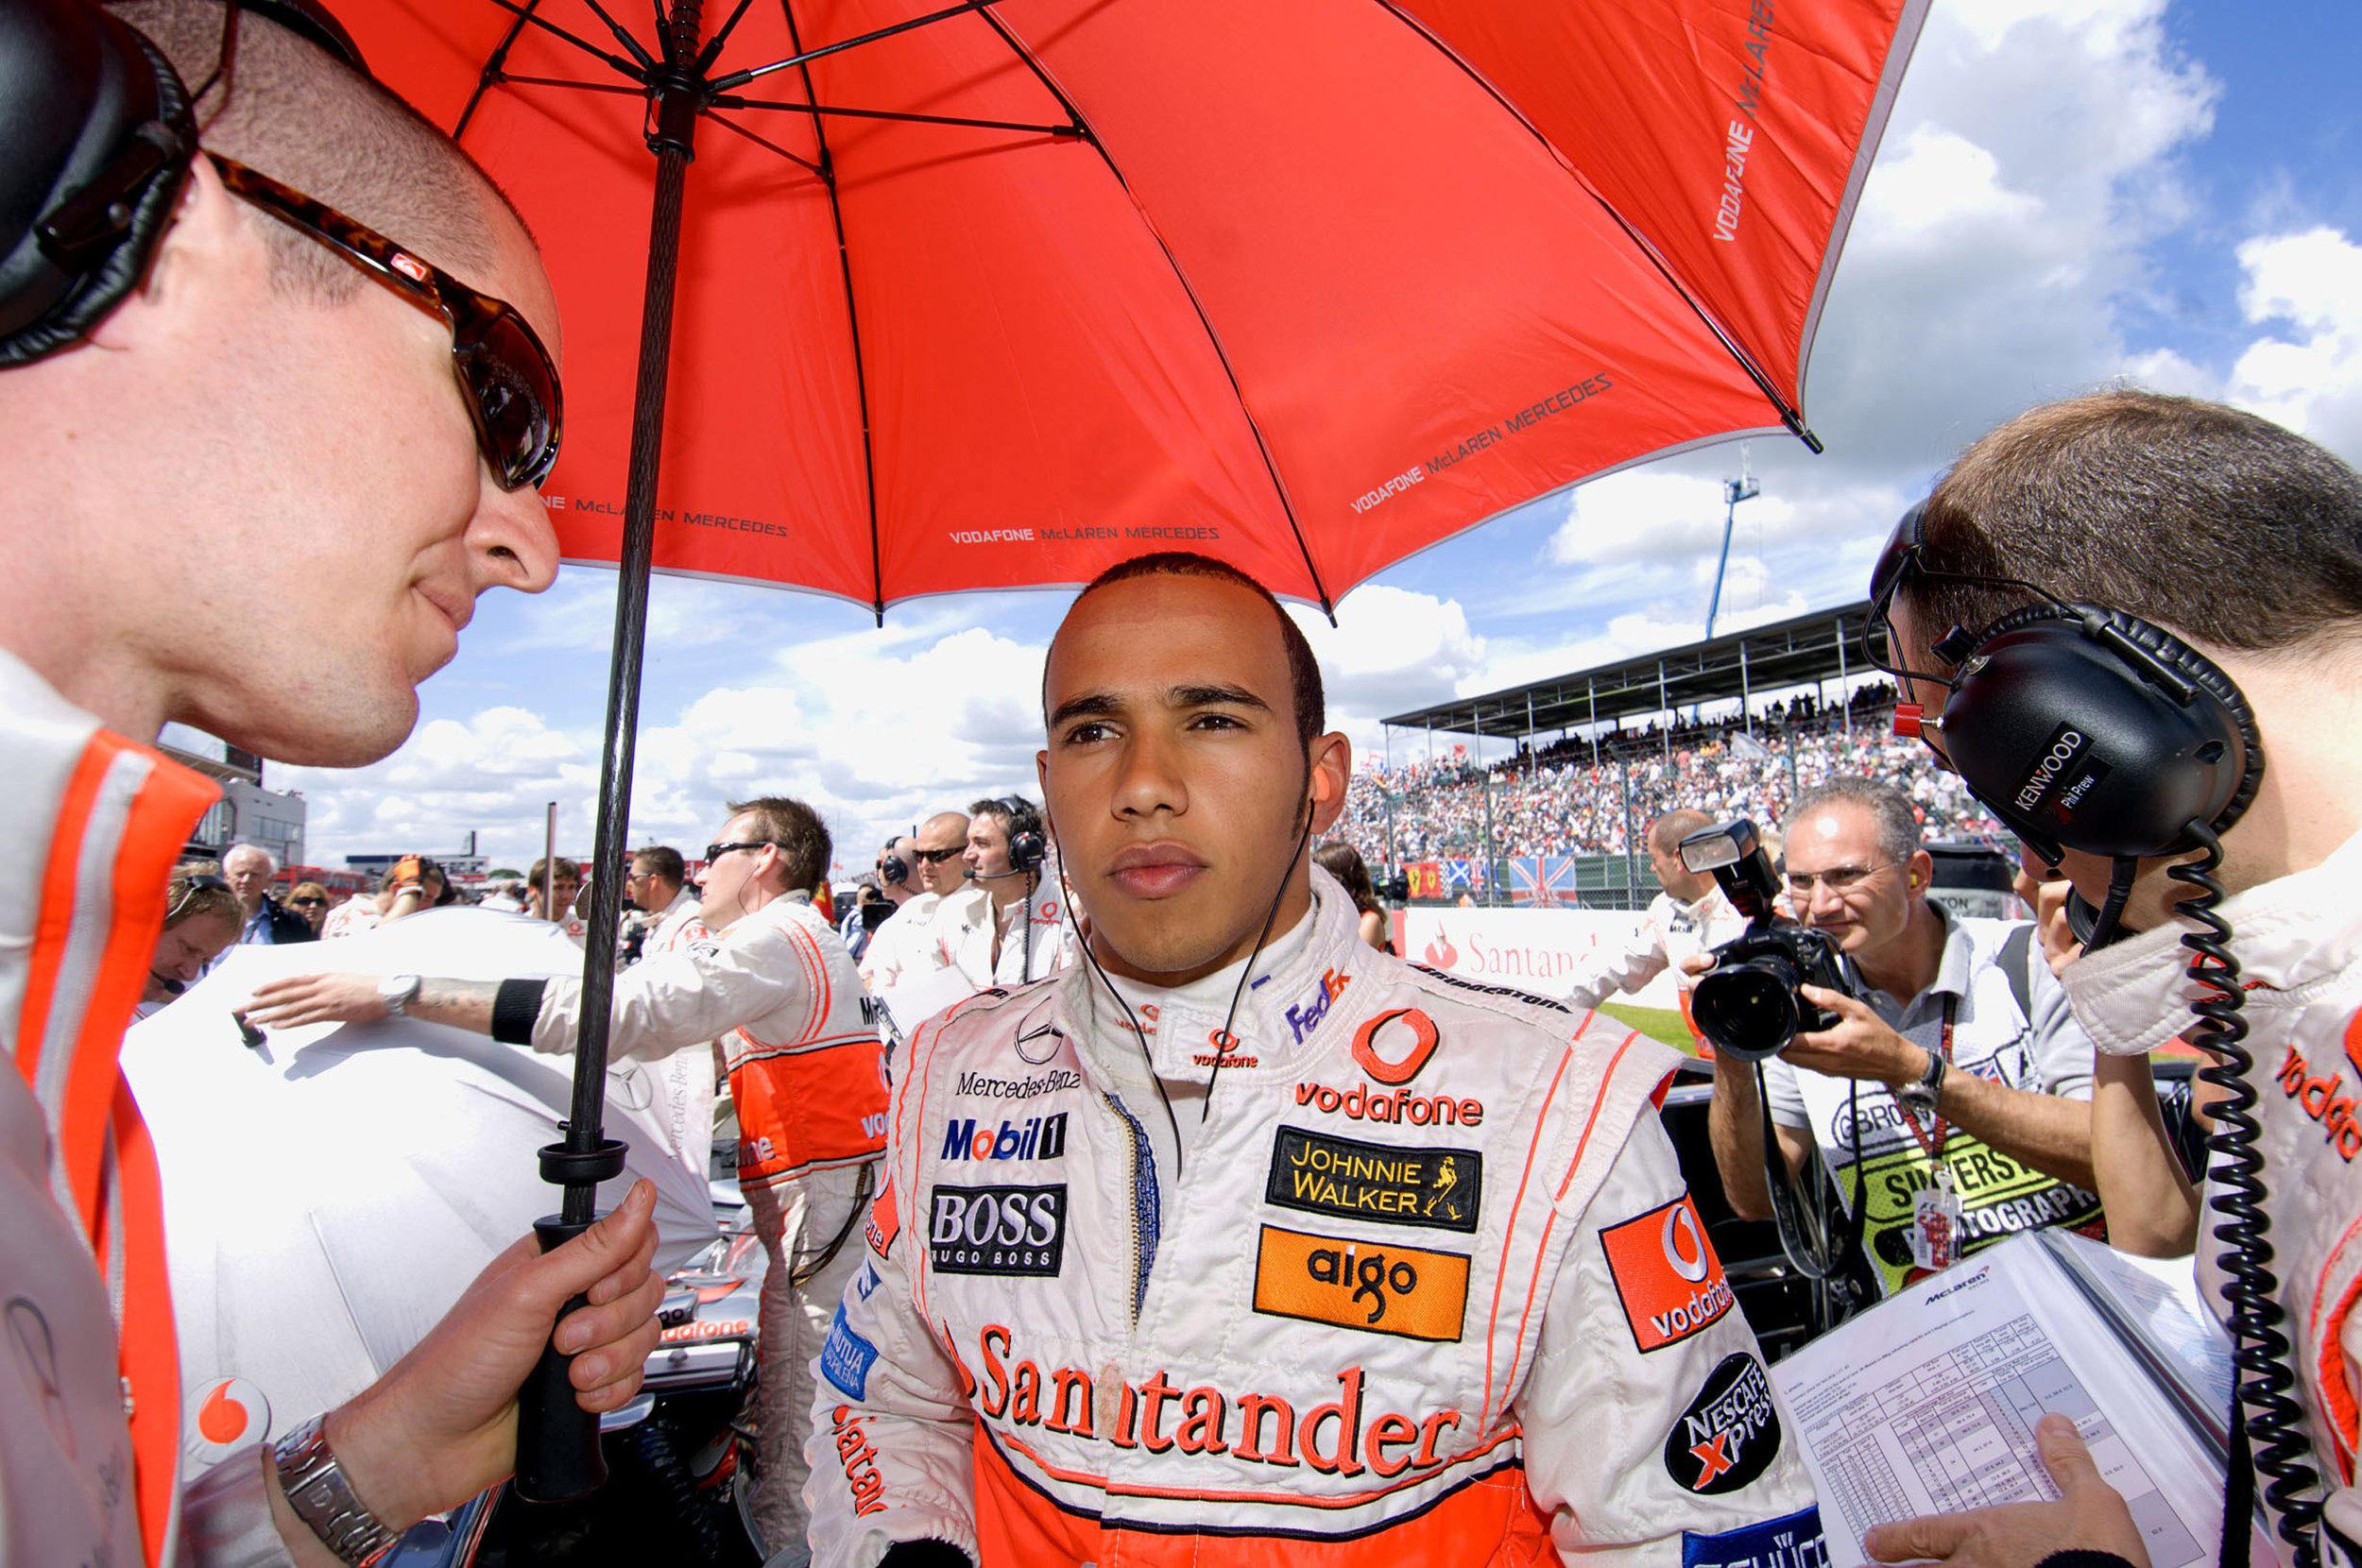 British Motor racing champion Lewis Hamilton